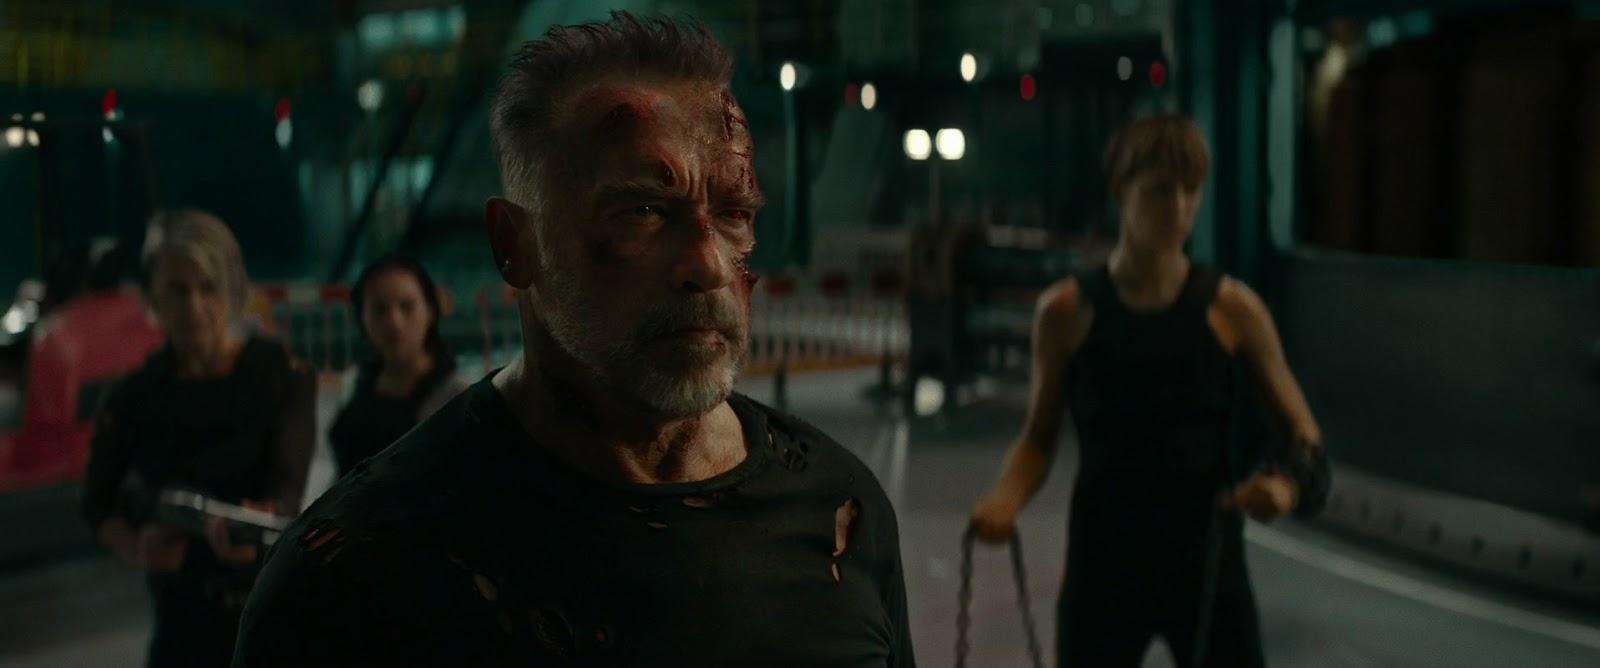 Terminator+Destino+oculto+%282019%29+HD+1080p+WEB-DL+Latino+-+Ingles+-+Descargatepelis.com.mkv_snapshot_01.46.16_%5B2020.01.14_01.08.48%5D.jpg (1600×668)